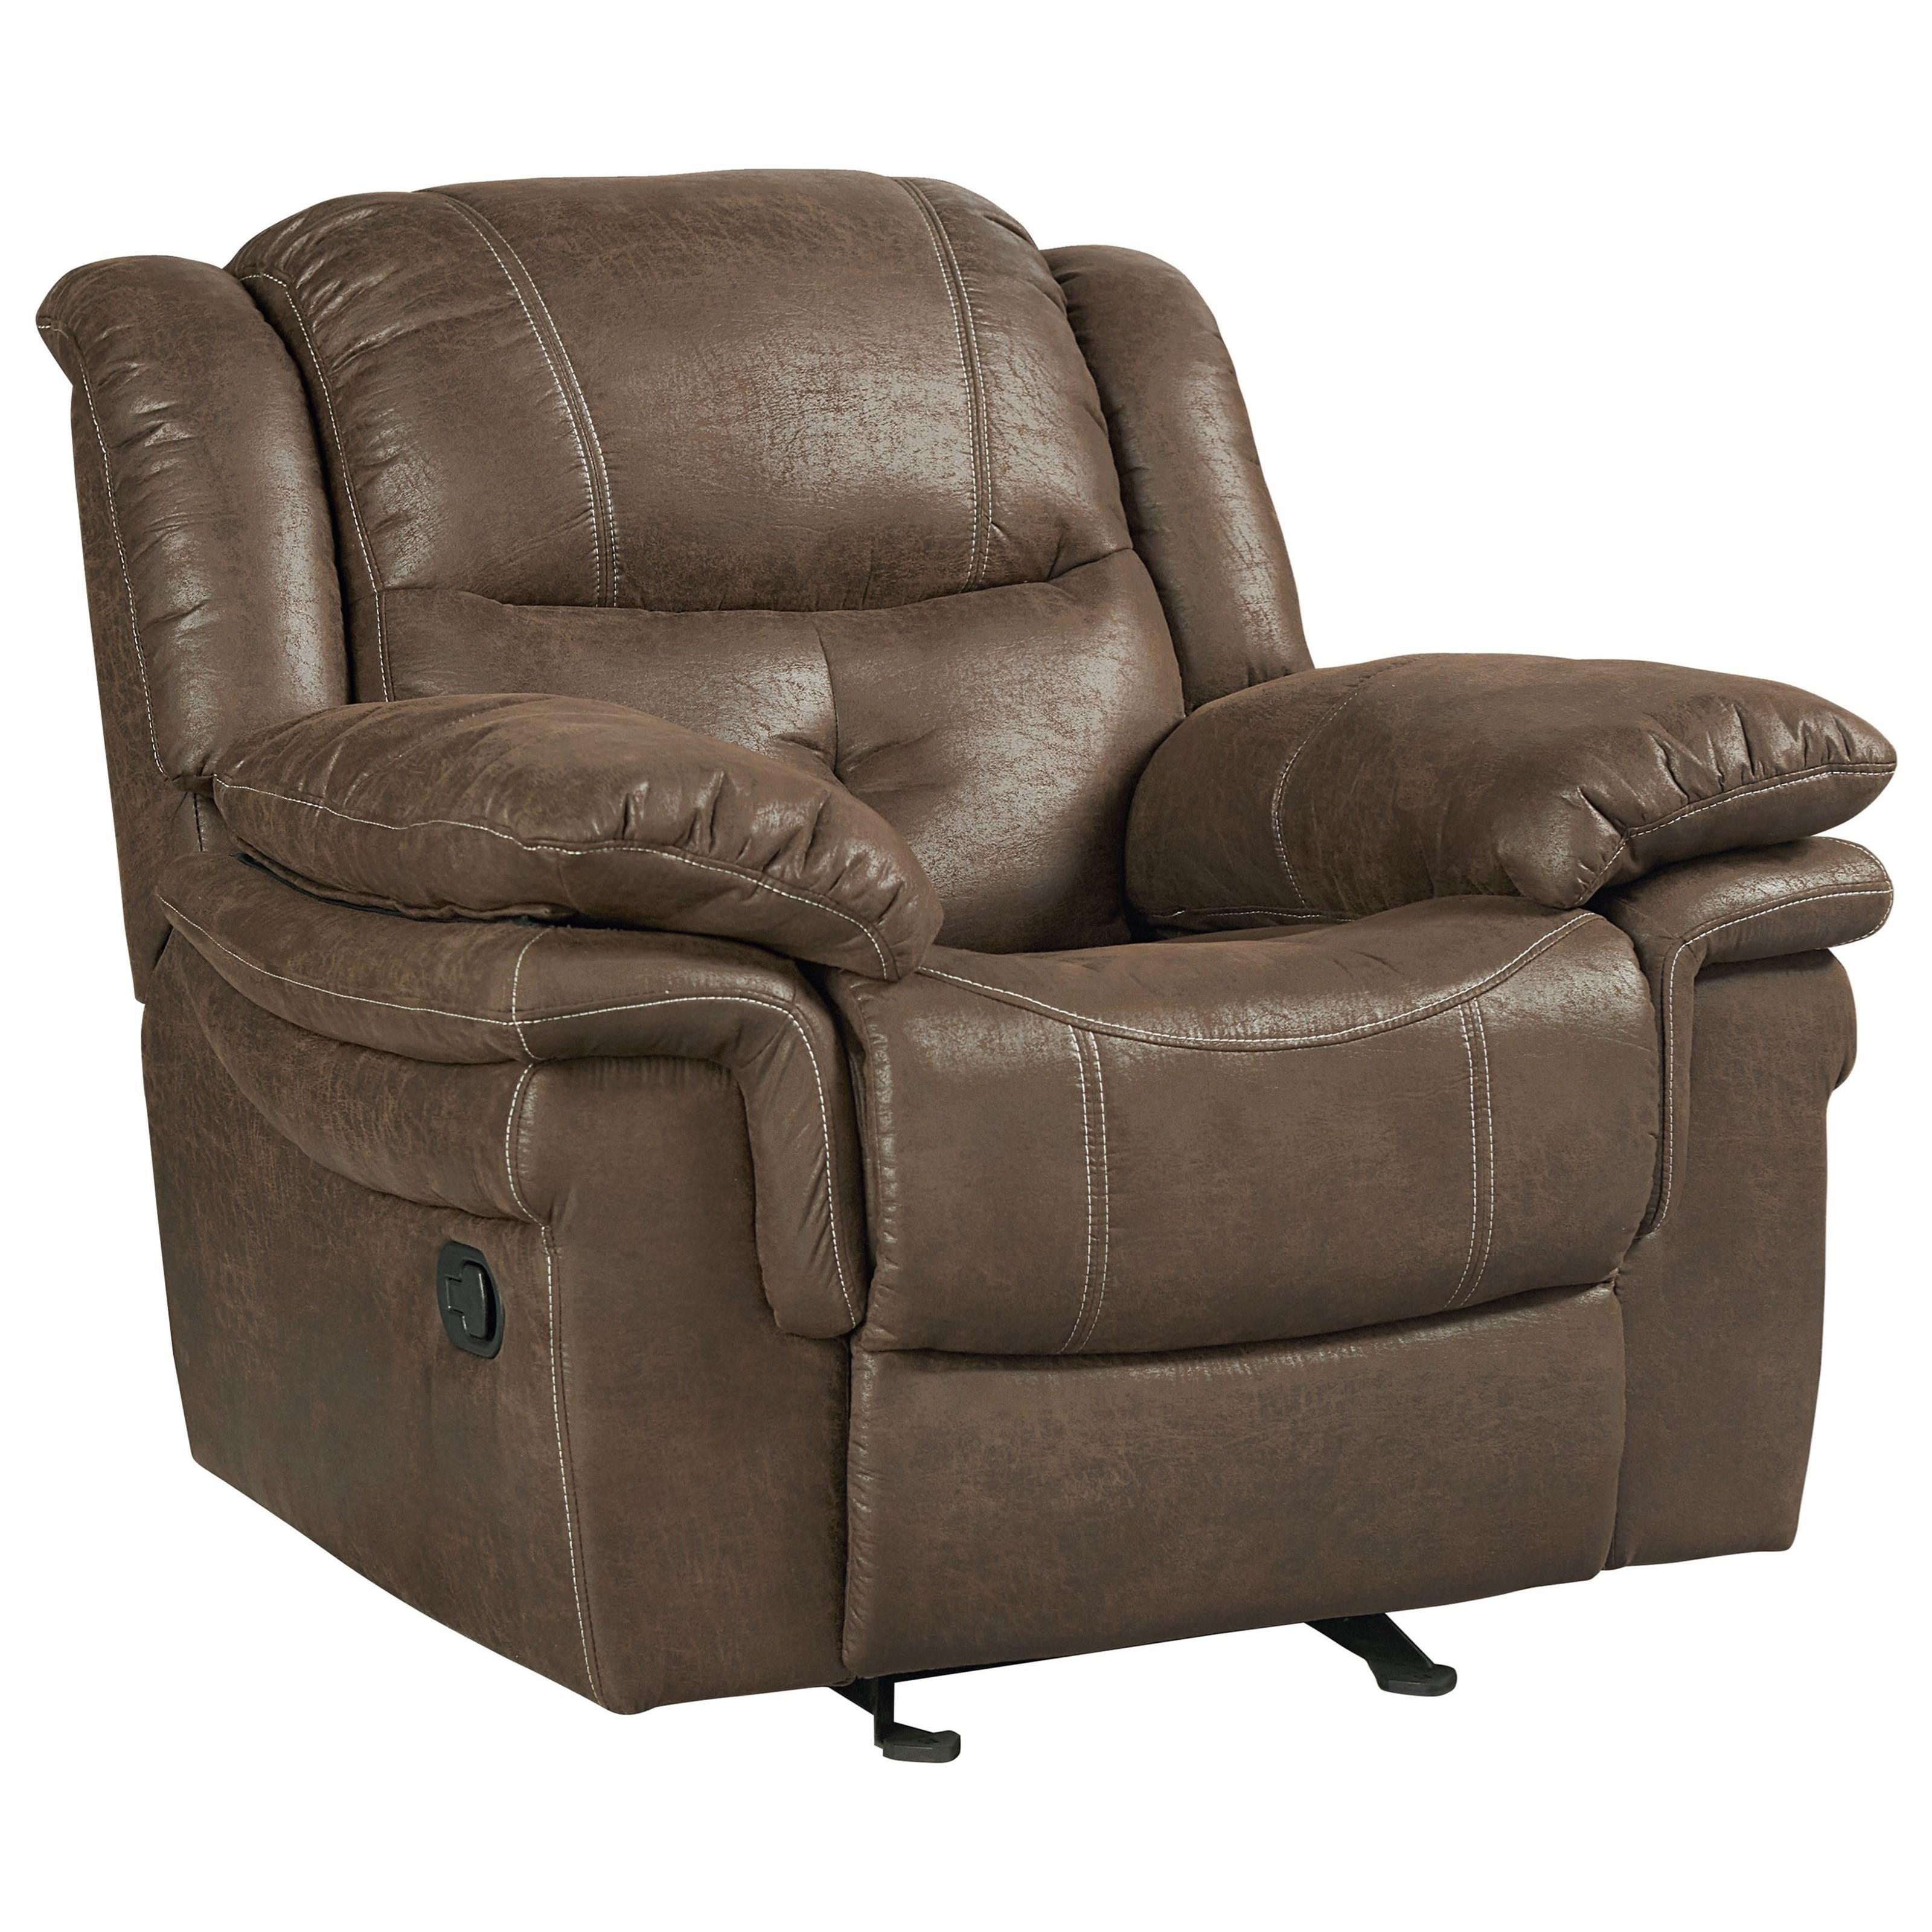 Standard Furniture Huxford Recliner - Item Number: 4007981